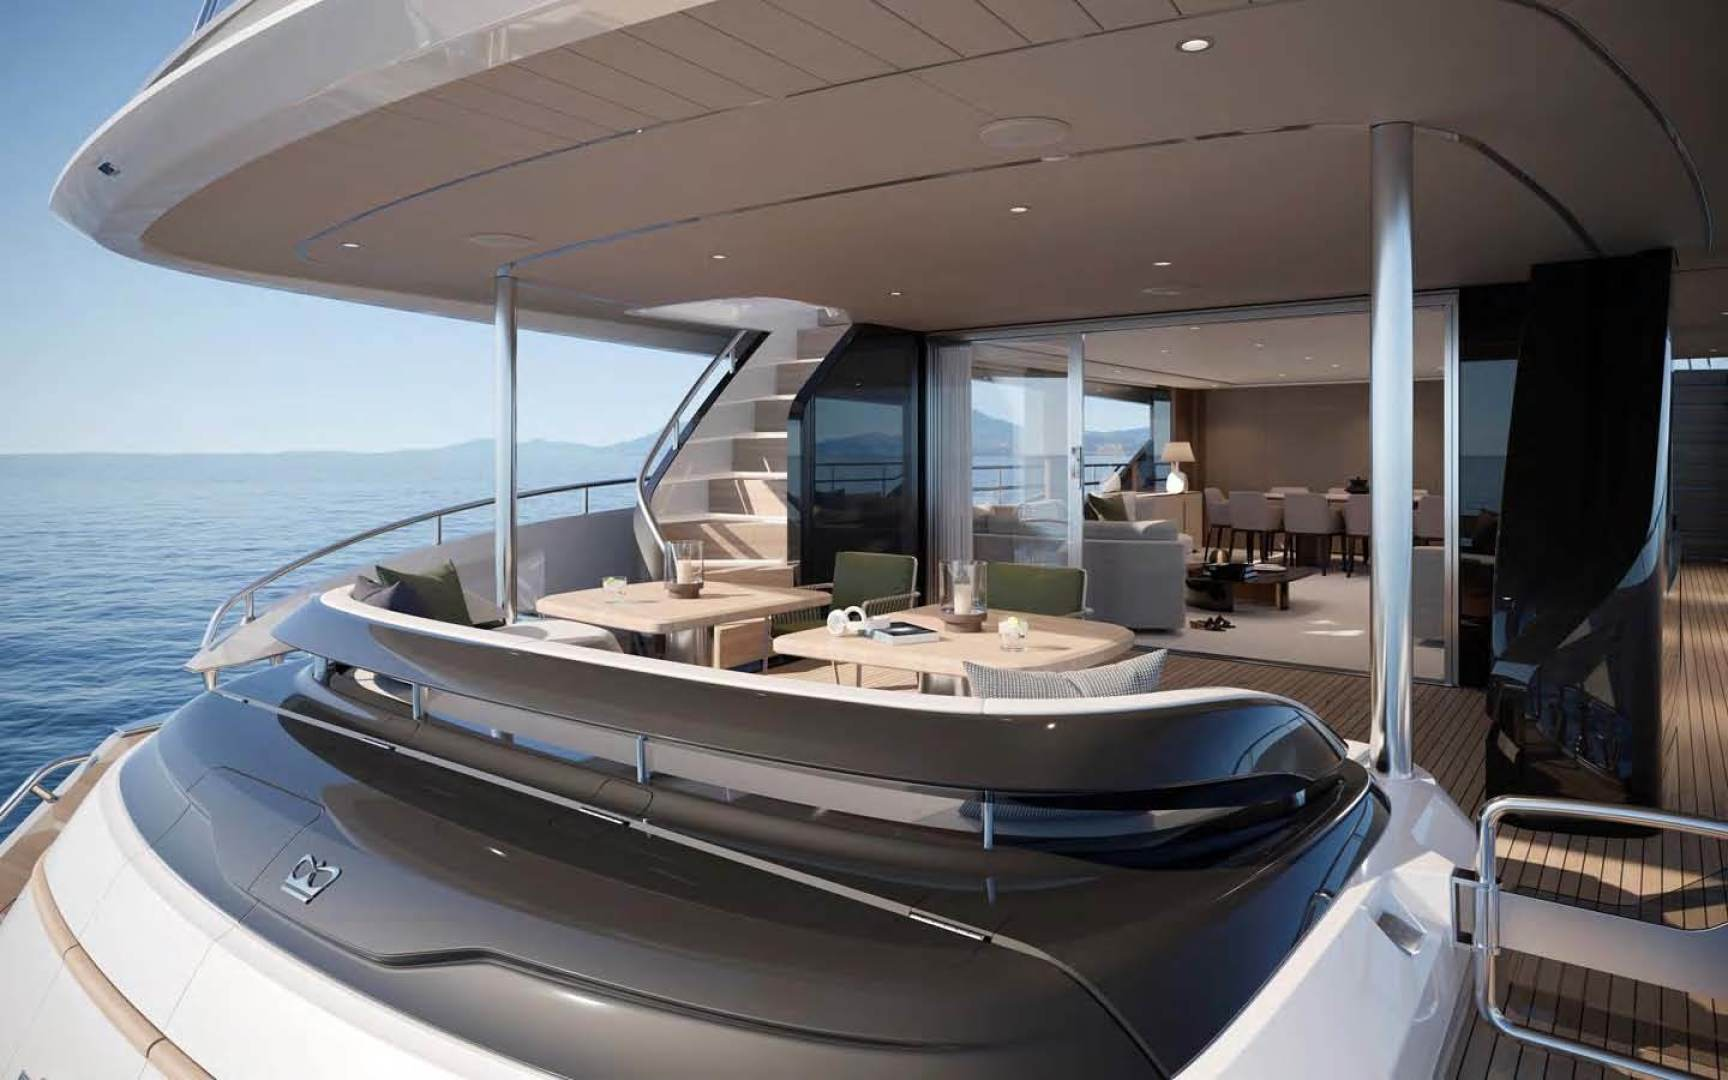 Princess-95 Motor Yacht 2022-Y95 Unknown-Florida-United States-1582762 | Thumbnail